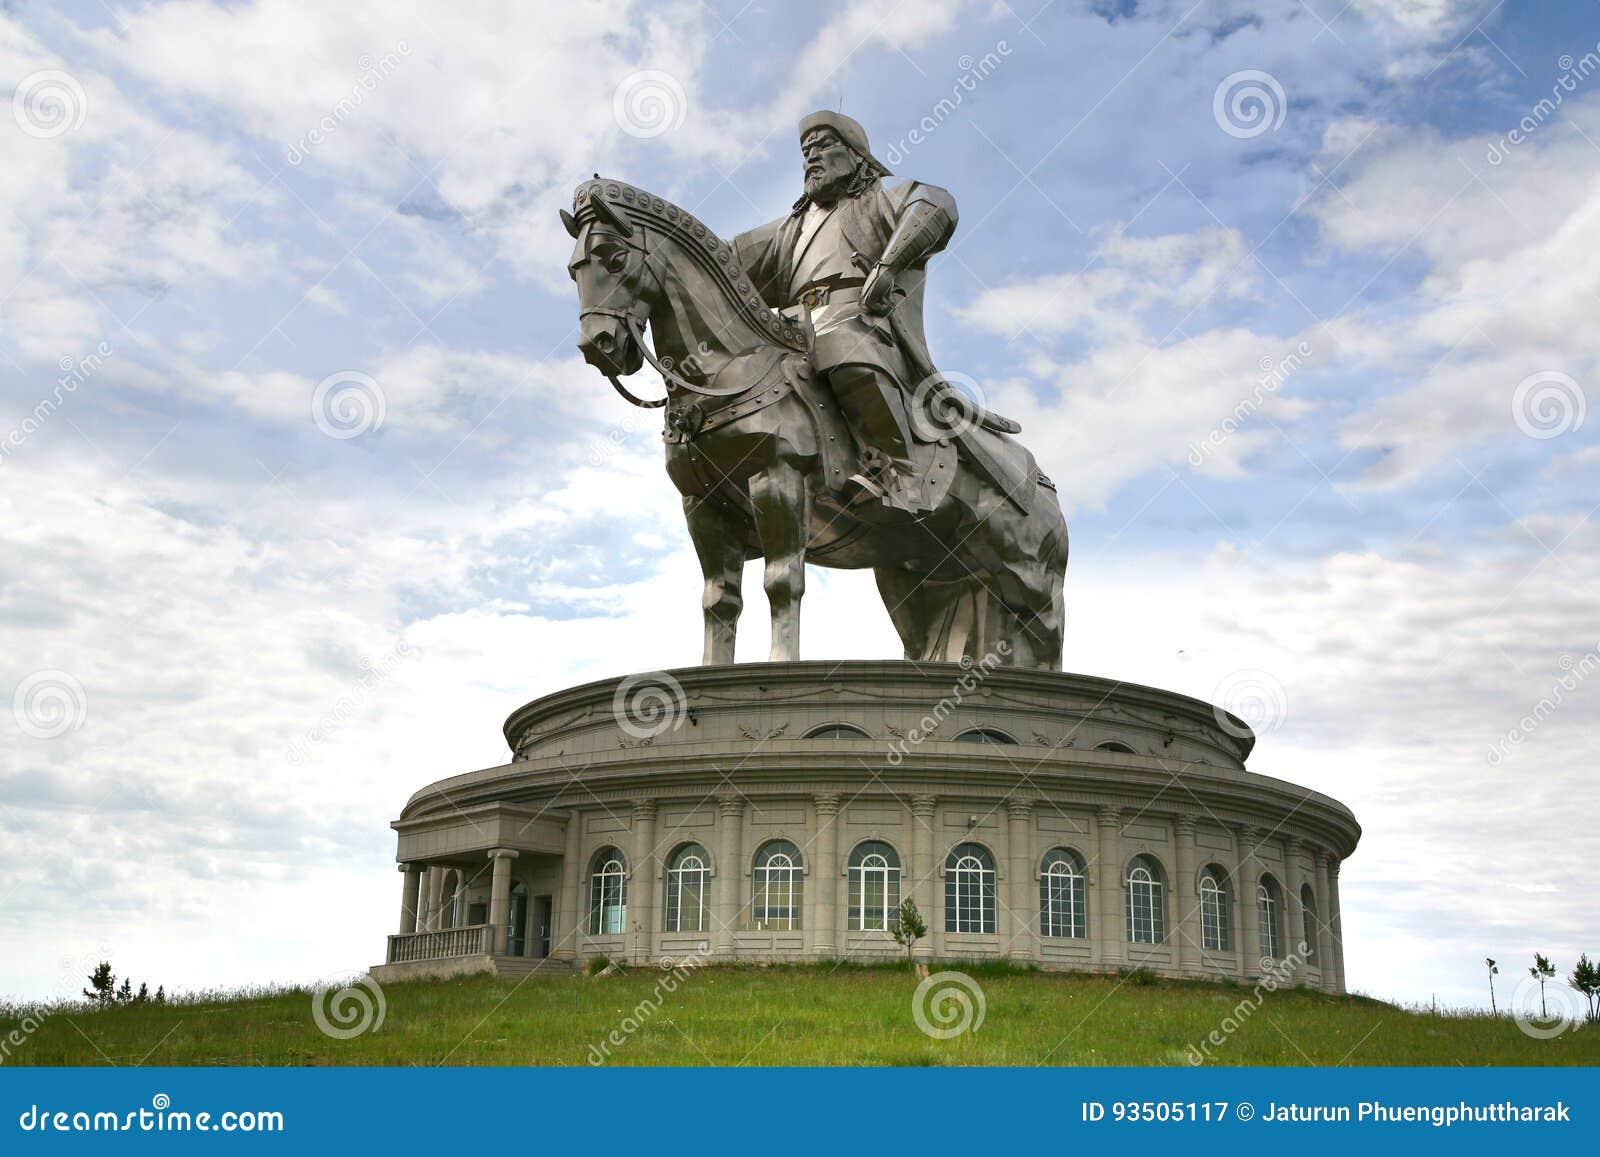 Ulaanbaatar Mongolia July 3 ,2016 At The Genghis Khan Statue on horseback, at Tsonjin Boldogeast of the Mongolian capital Ulaanbaa